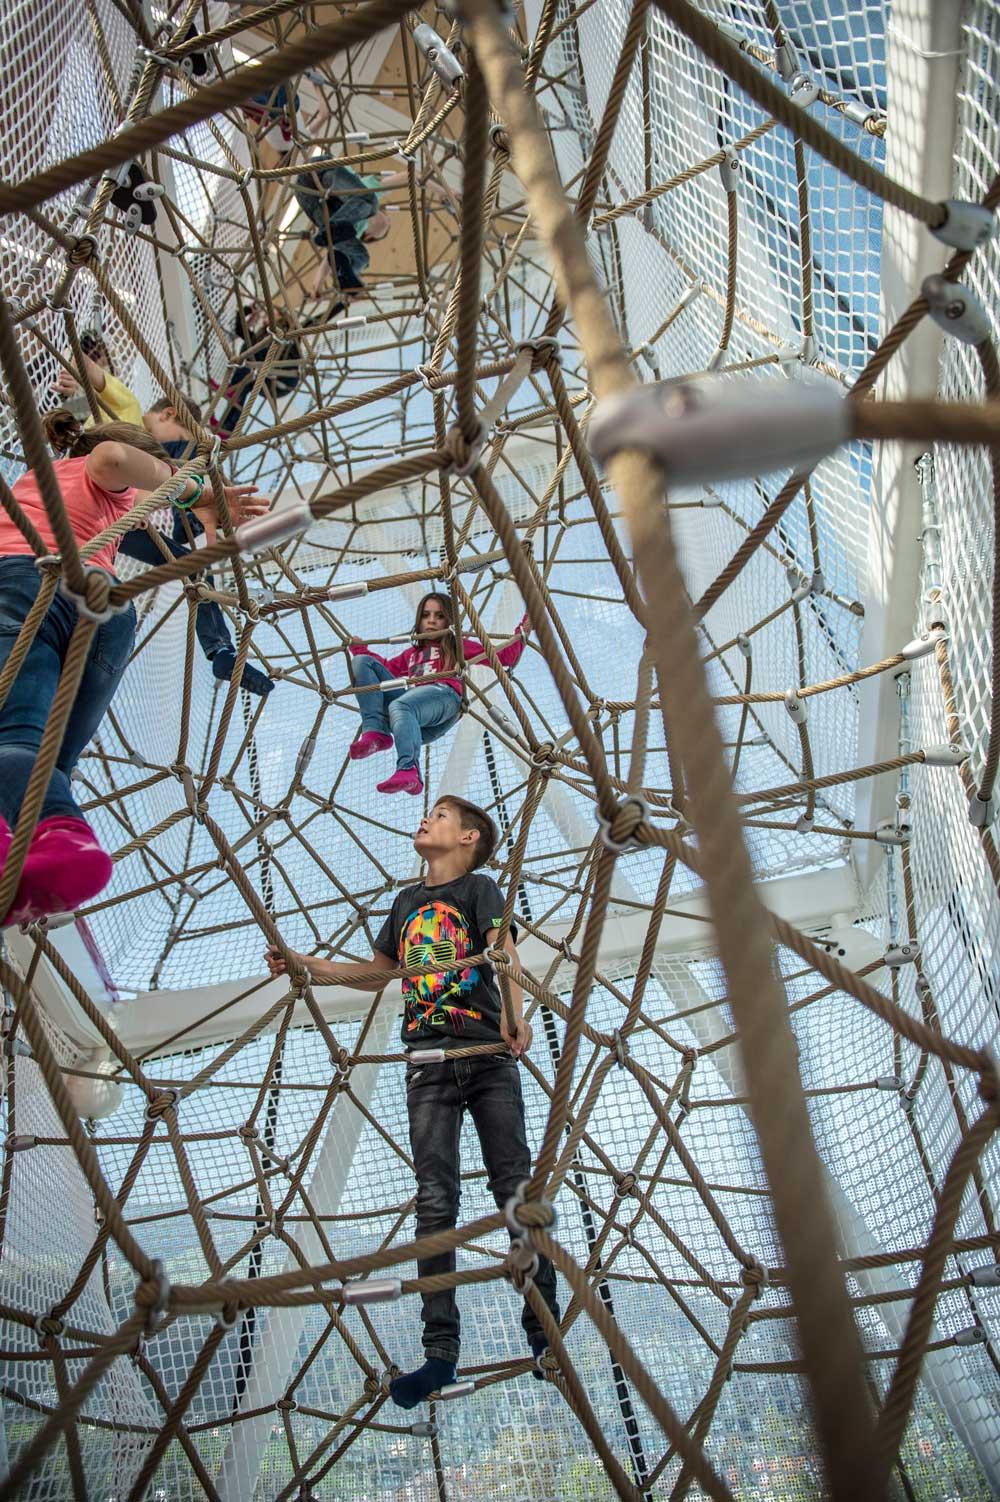 Swarovski, indoor spatial net - Berliner Seilfabrik – Play equipment for life